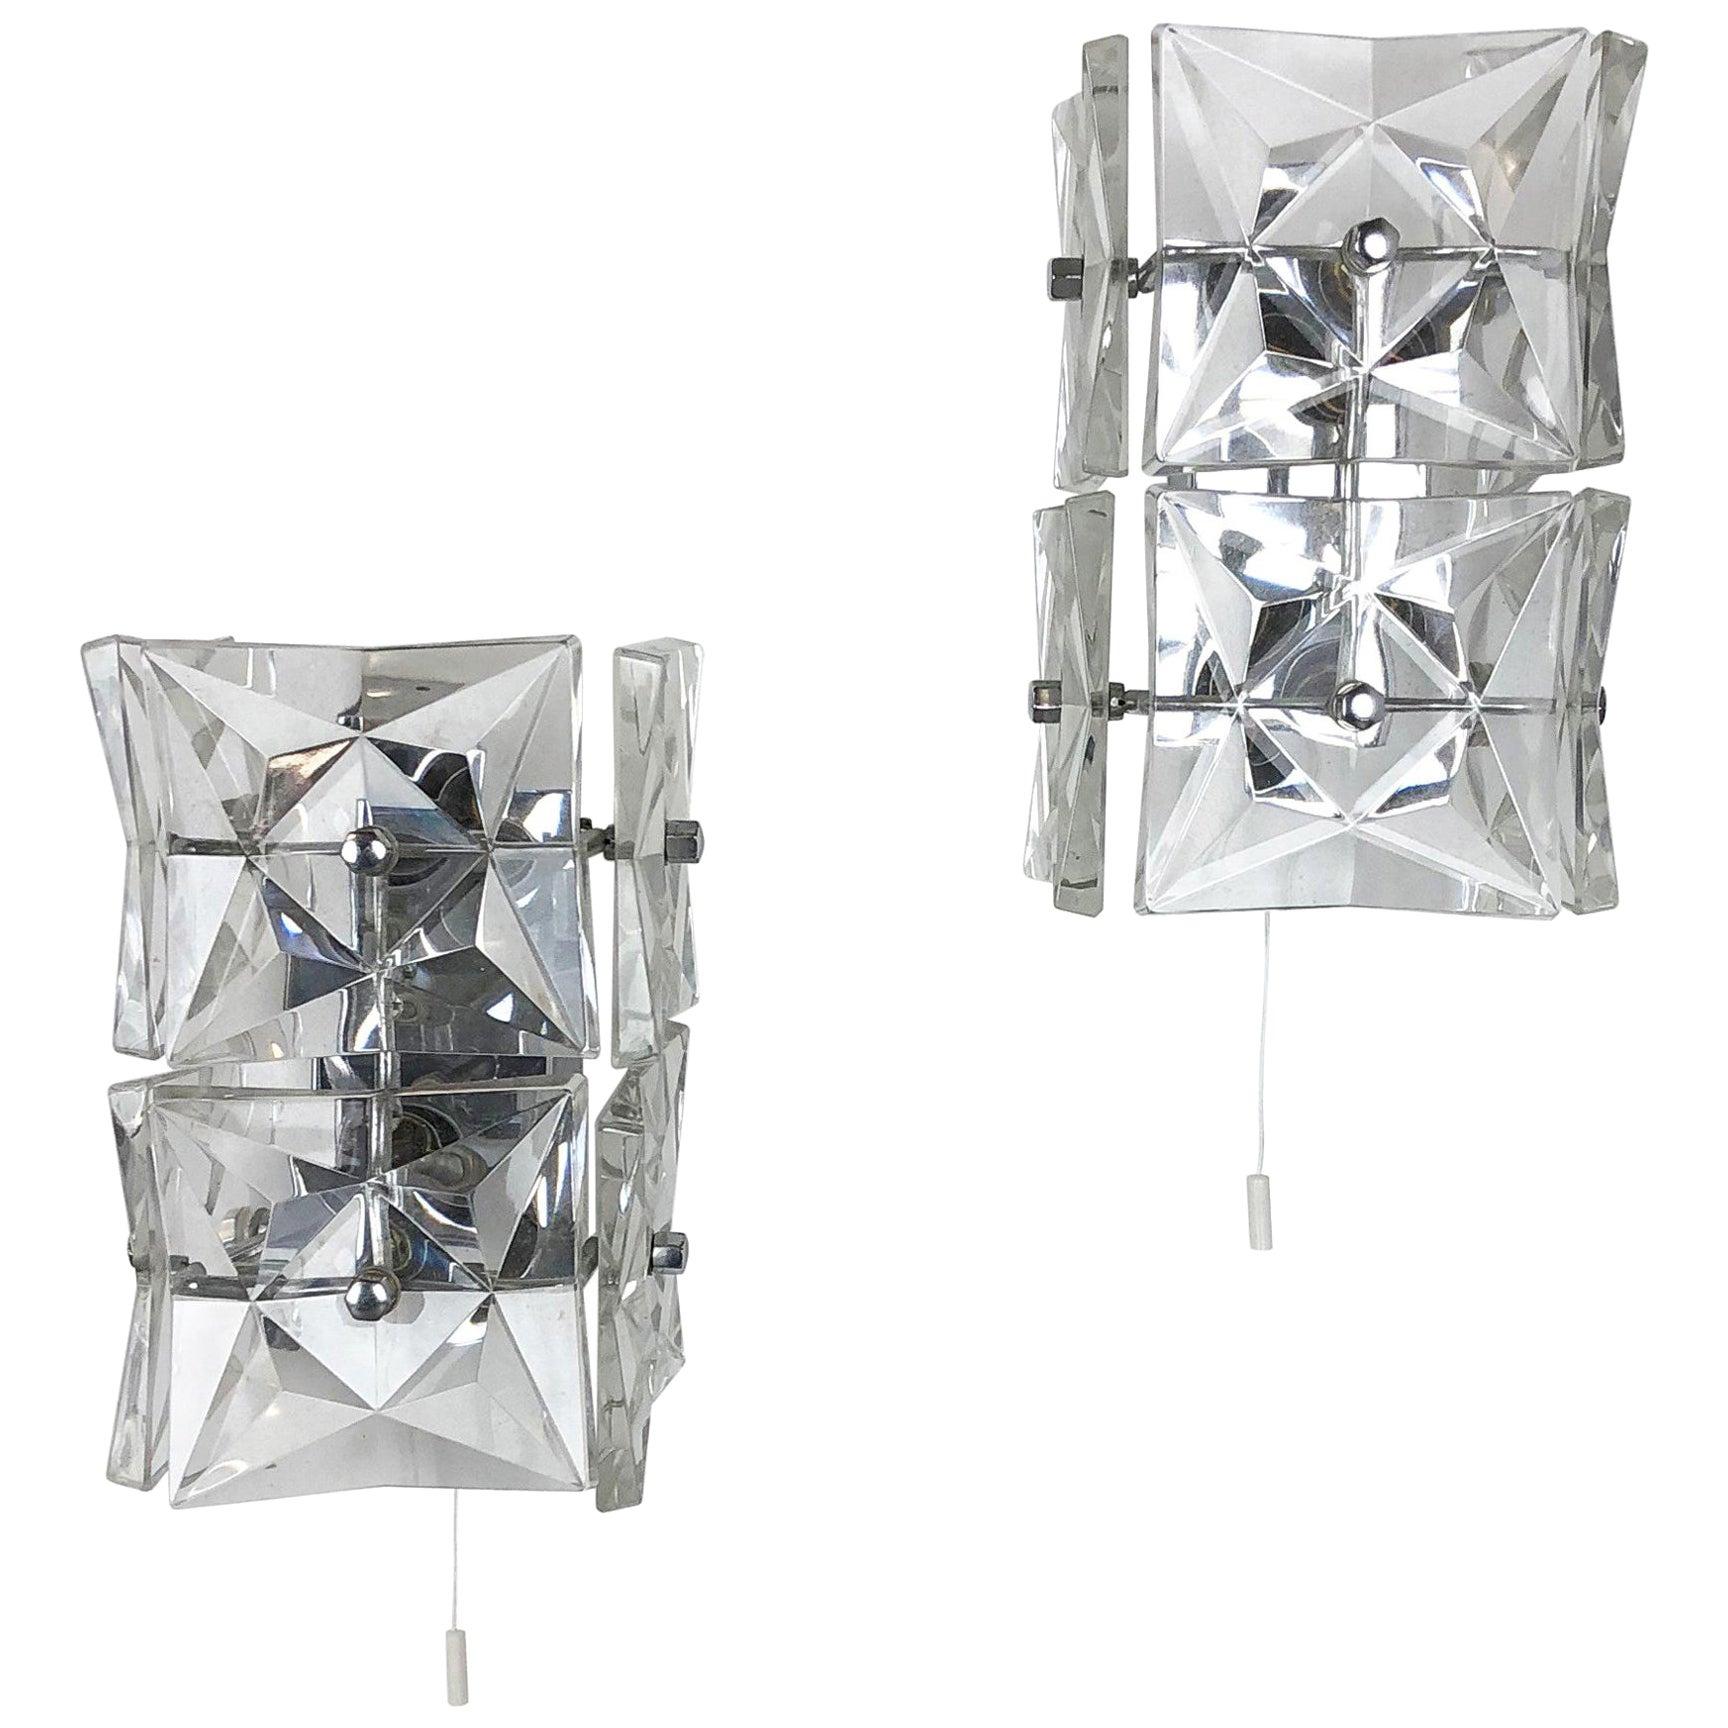 Set of 2 Huge Prismatic Crystal Glass Wall Light Sconces by Kinkeldey, Germany